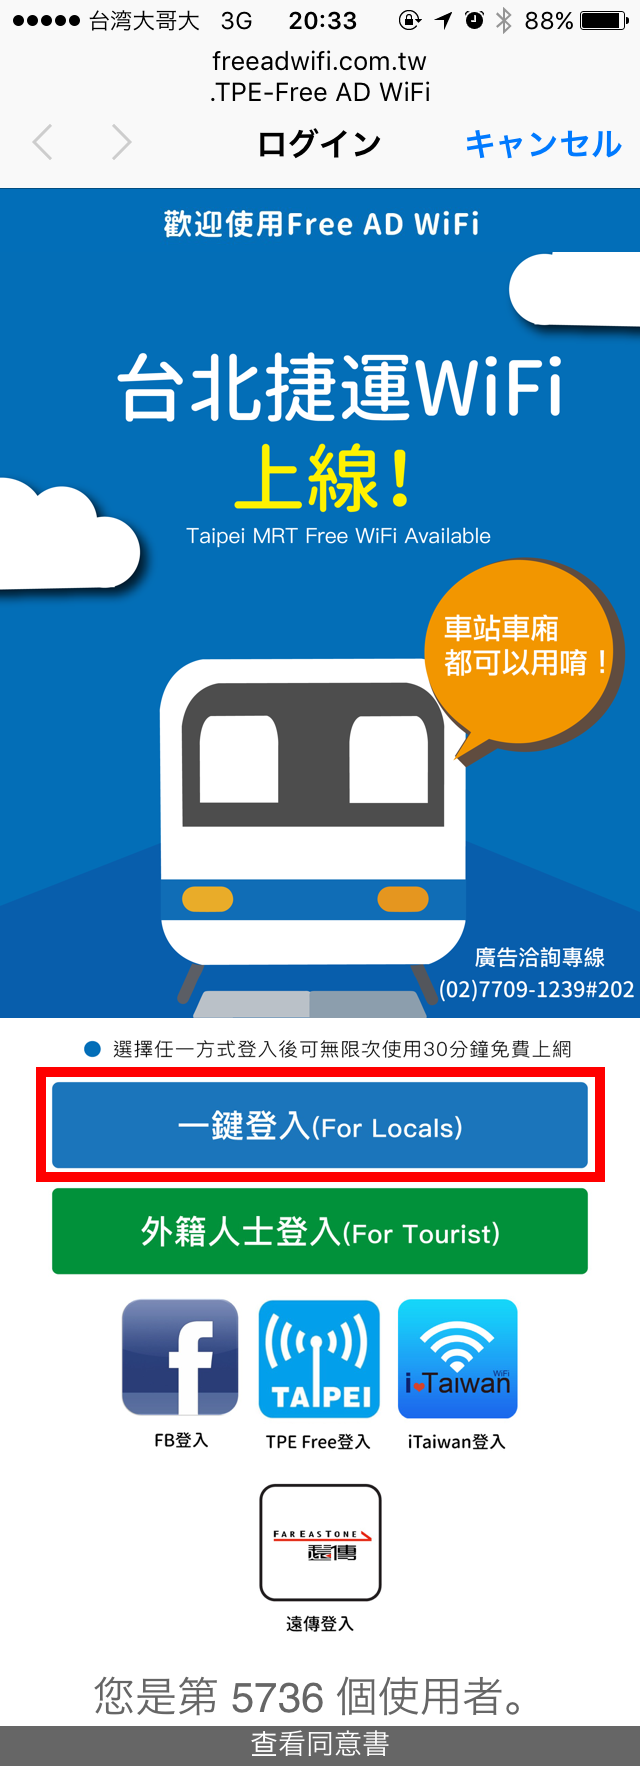 .TPE-Free AD WiFiのログイン画面01